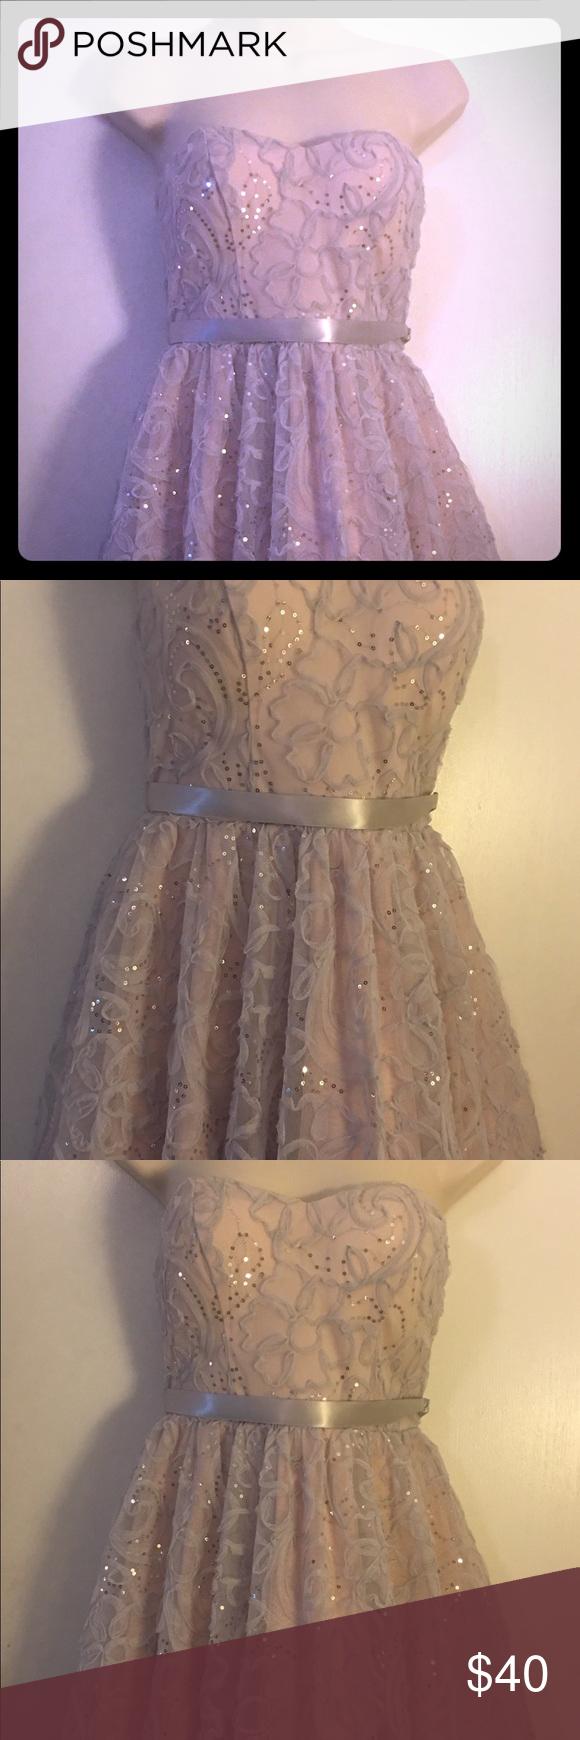 B smart formal dress size sequin shorts smart dress and formal